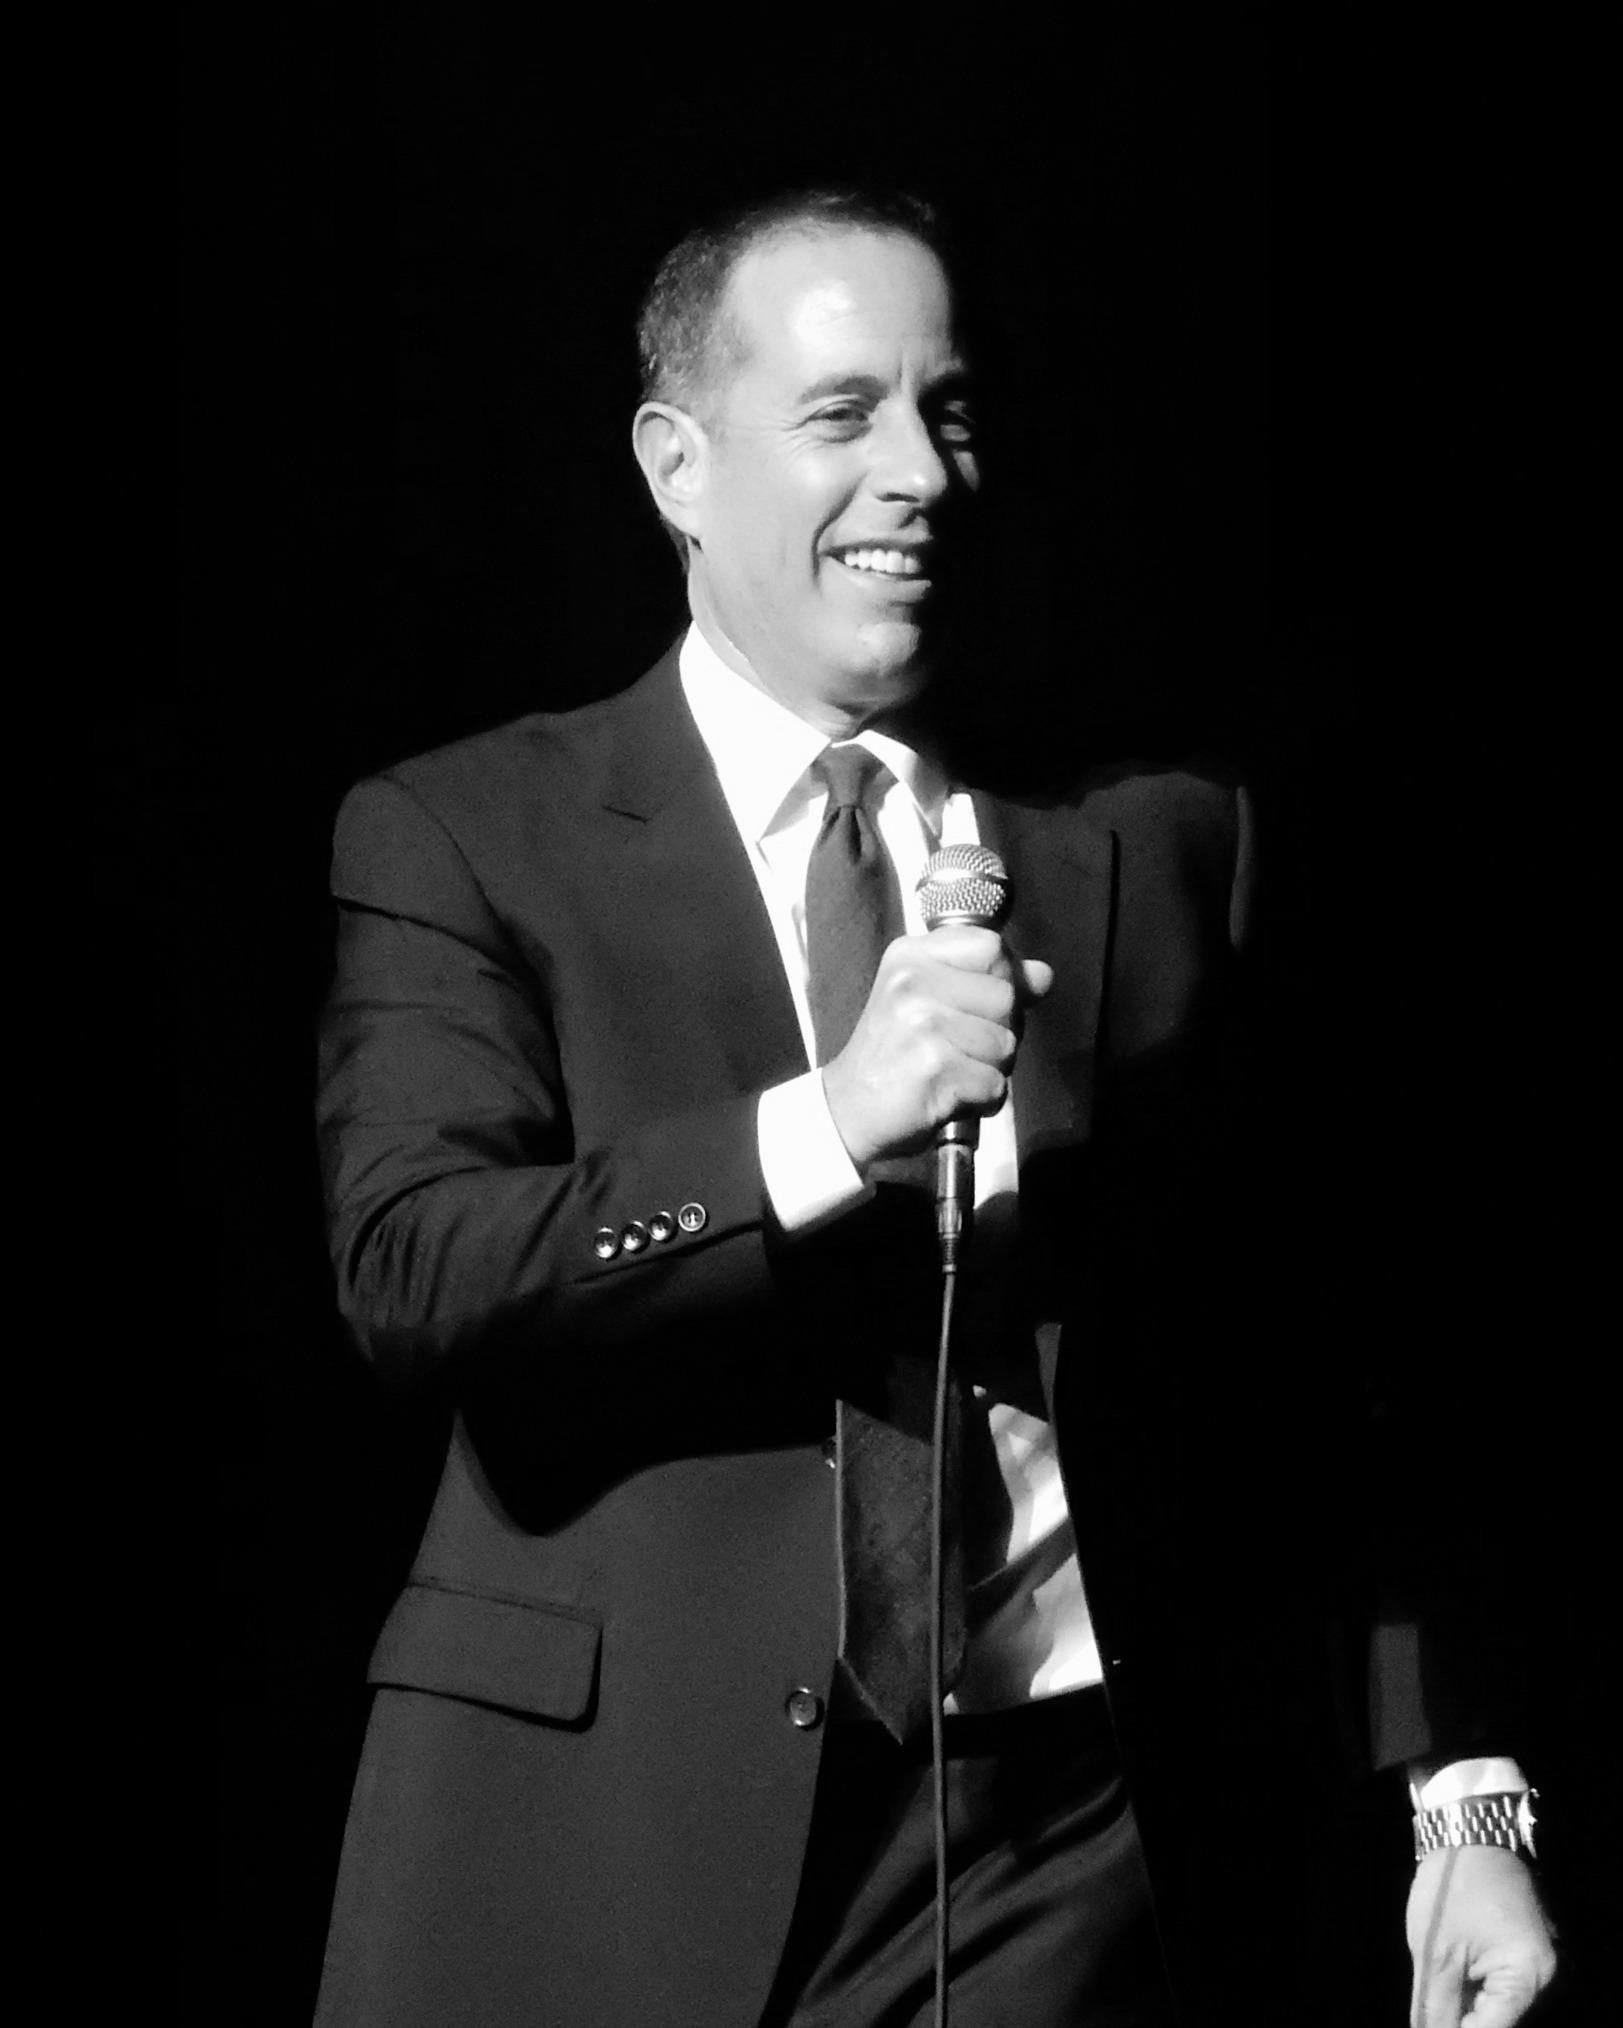 Jerry_Seinfeld_2016_-_3.jpg